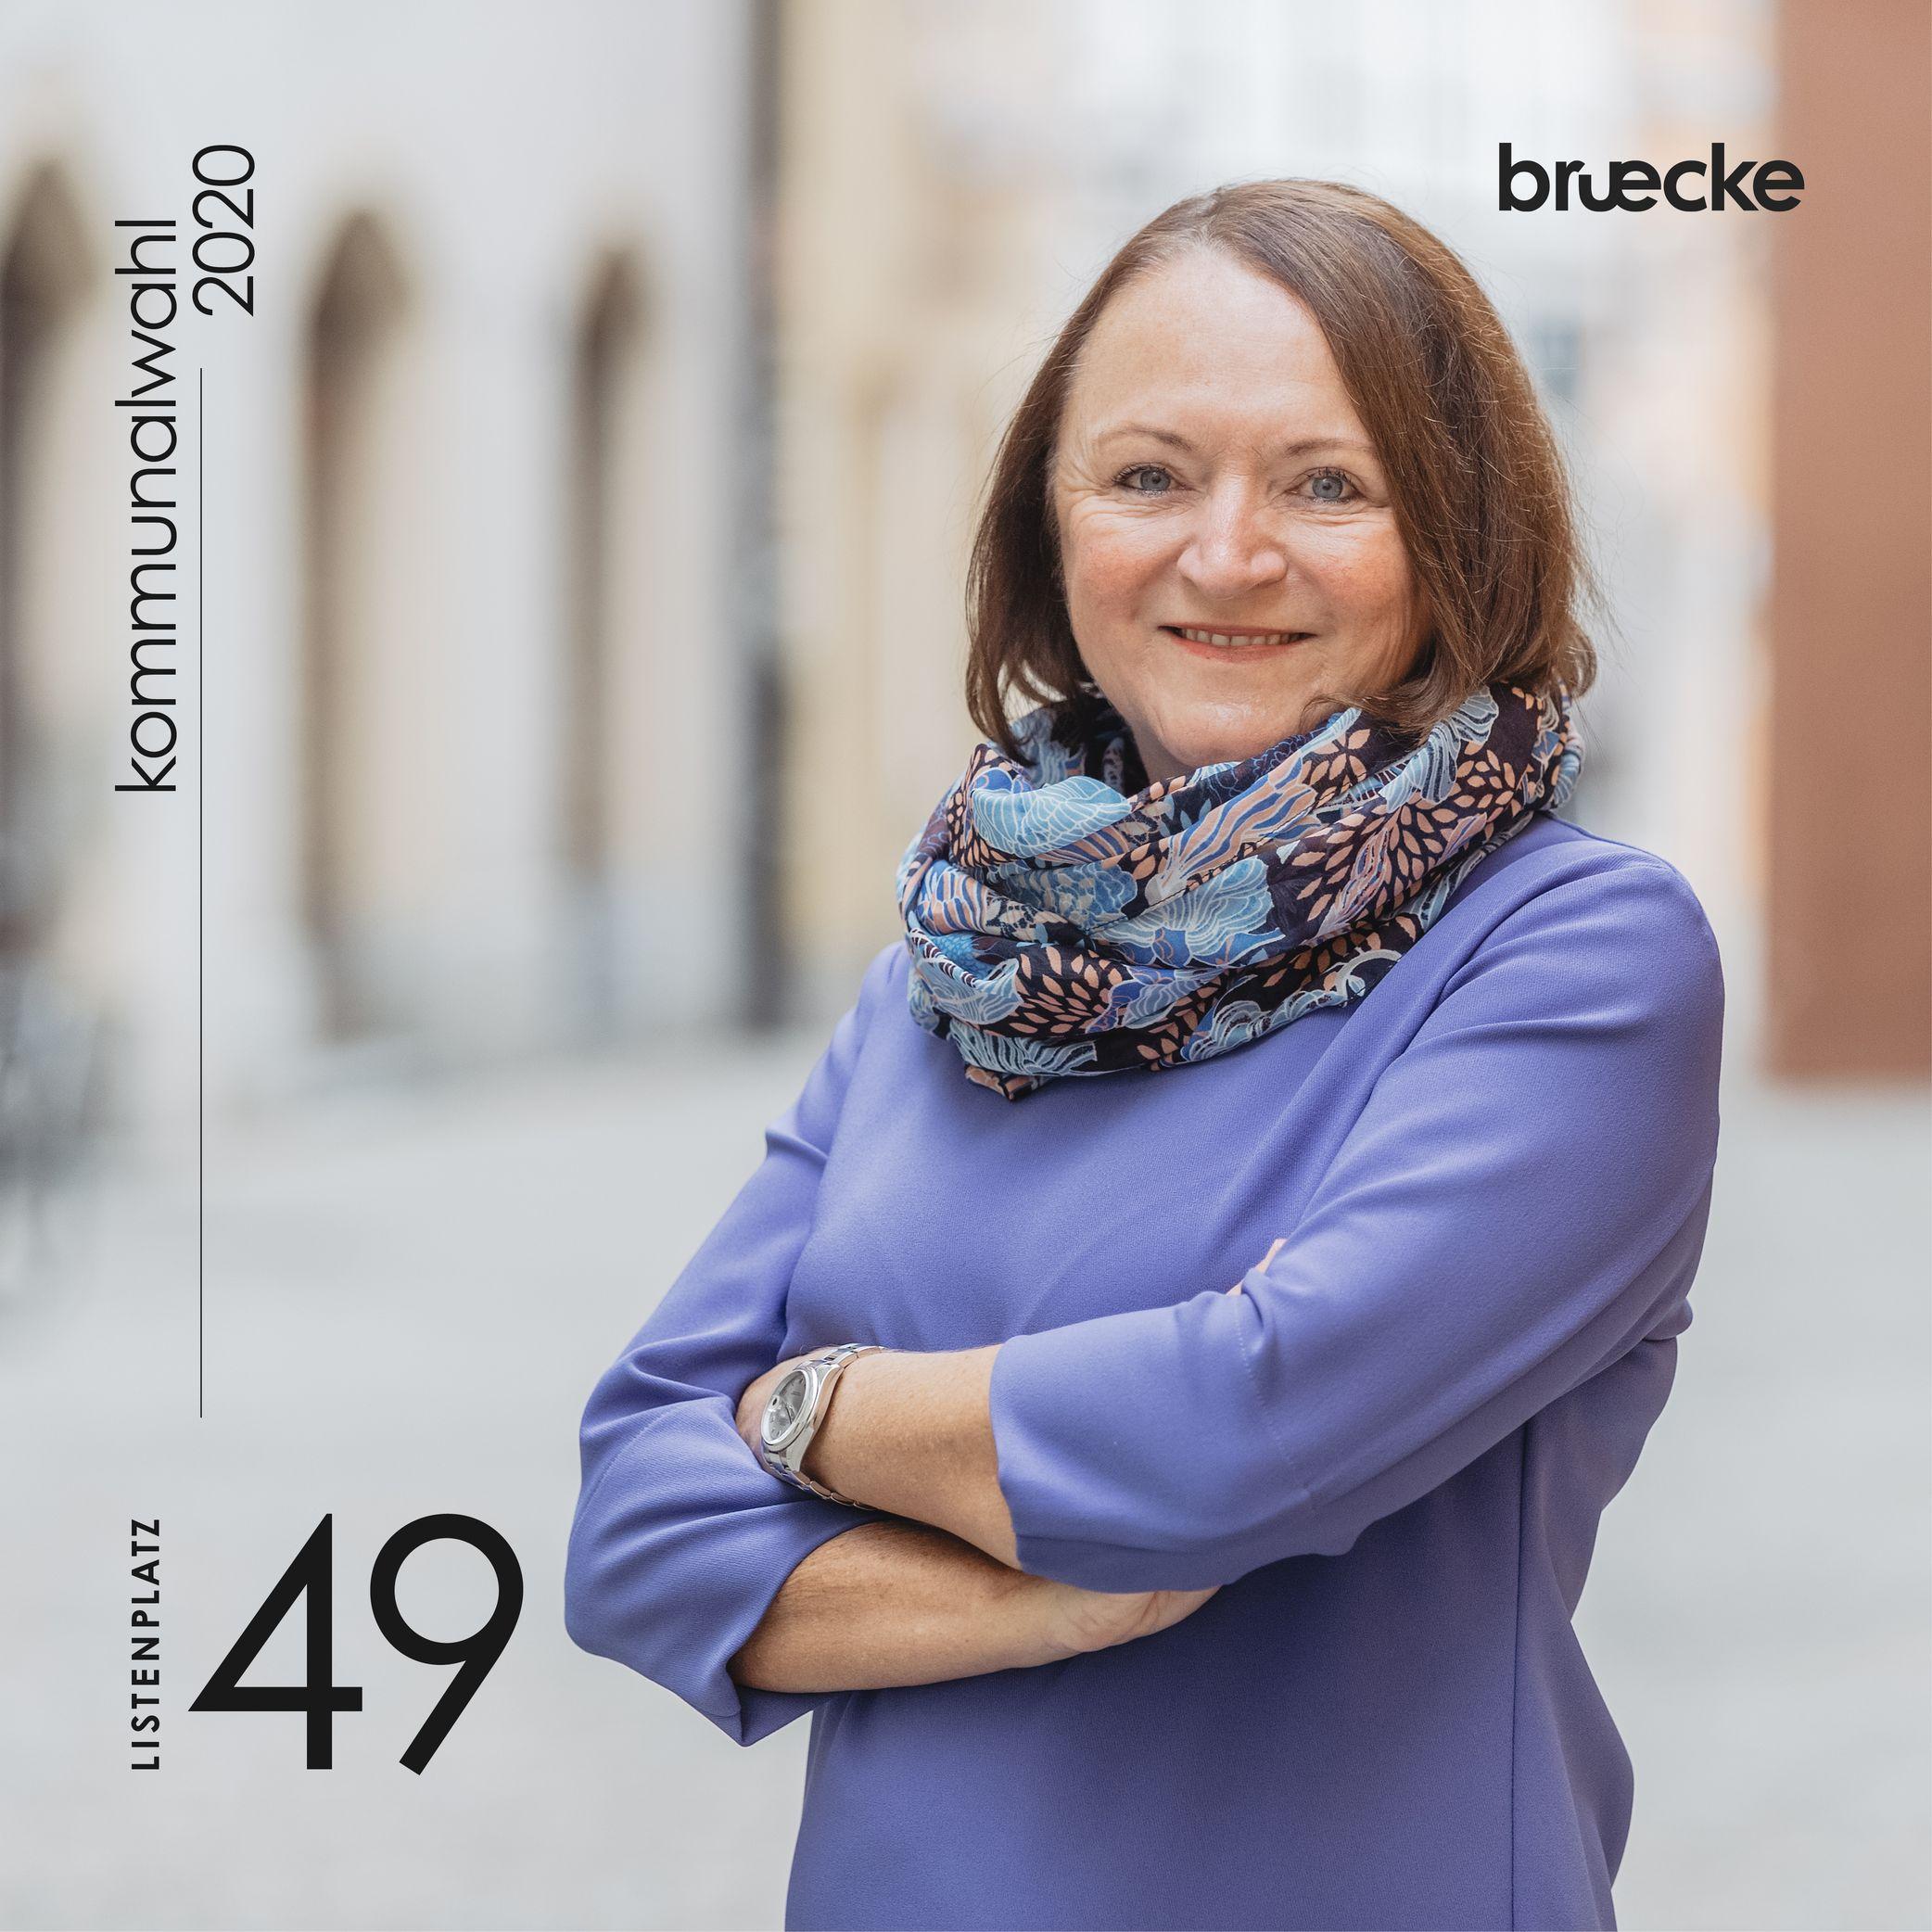 Eva Brandl